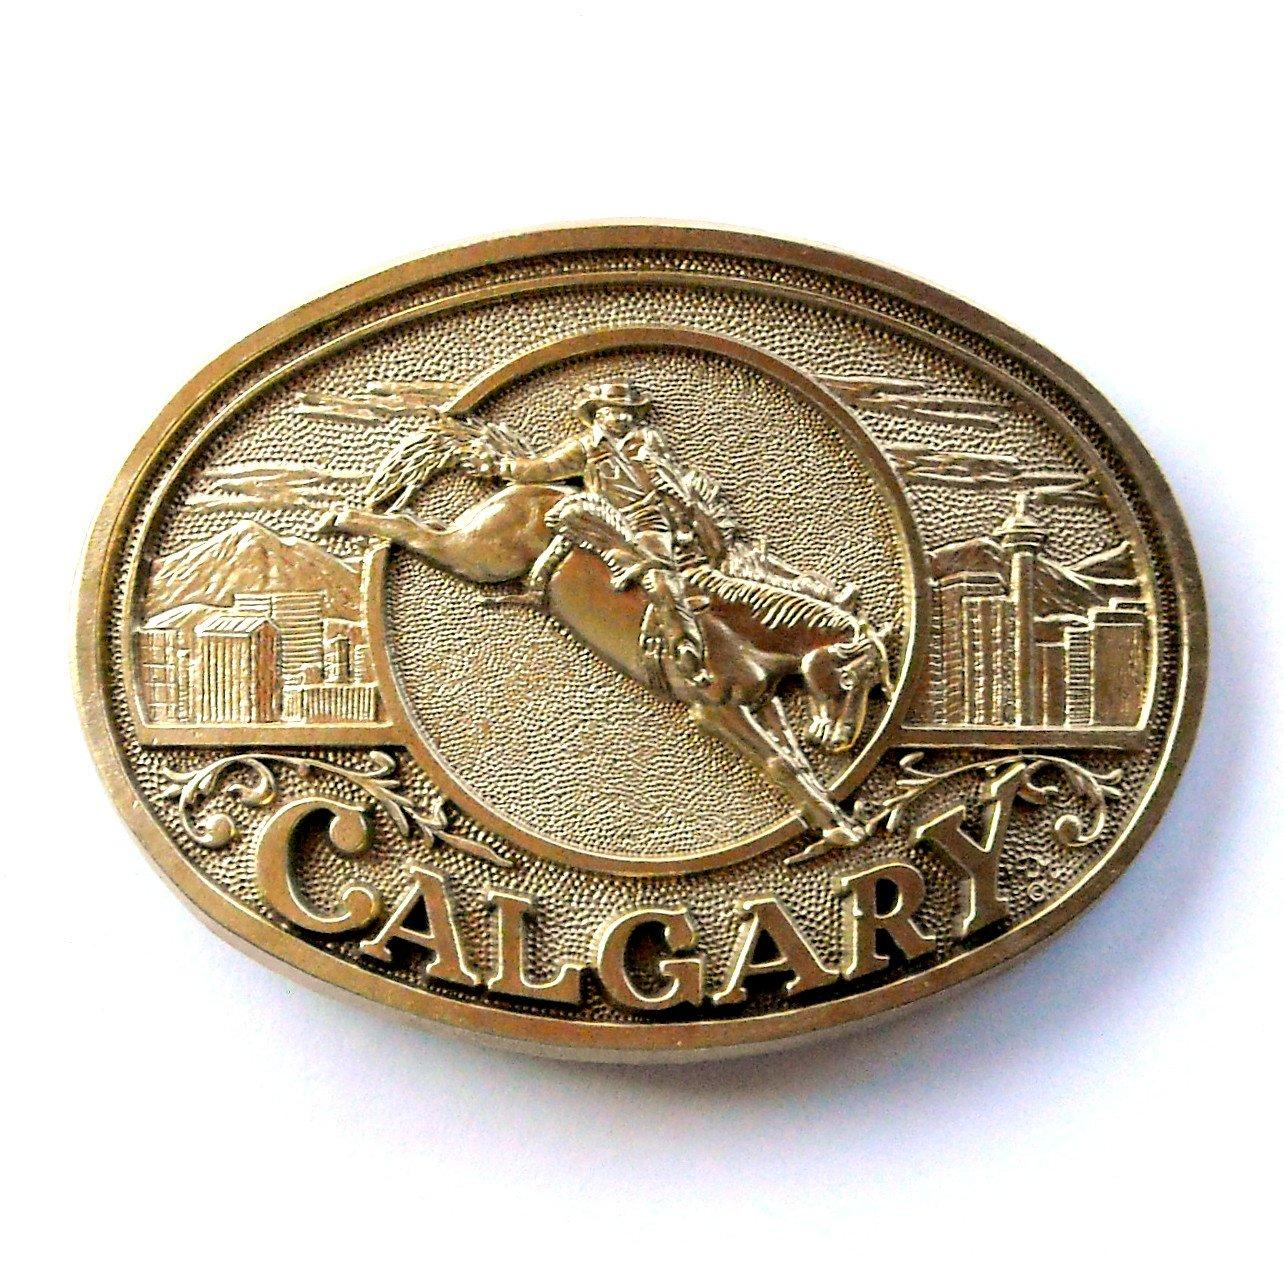 Calgary Stampede Rodeo Award Design Solid Brass Belt Buckle